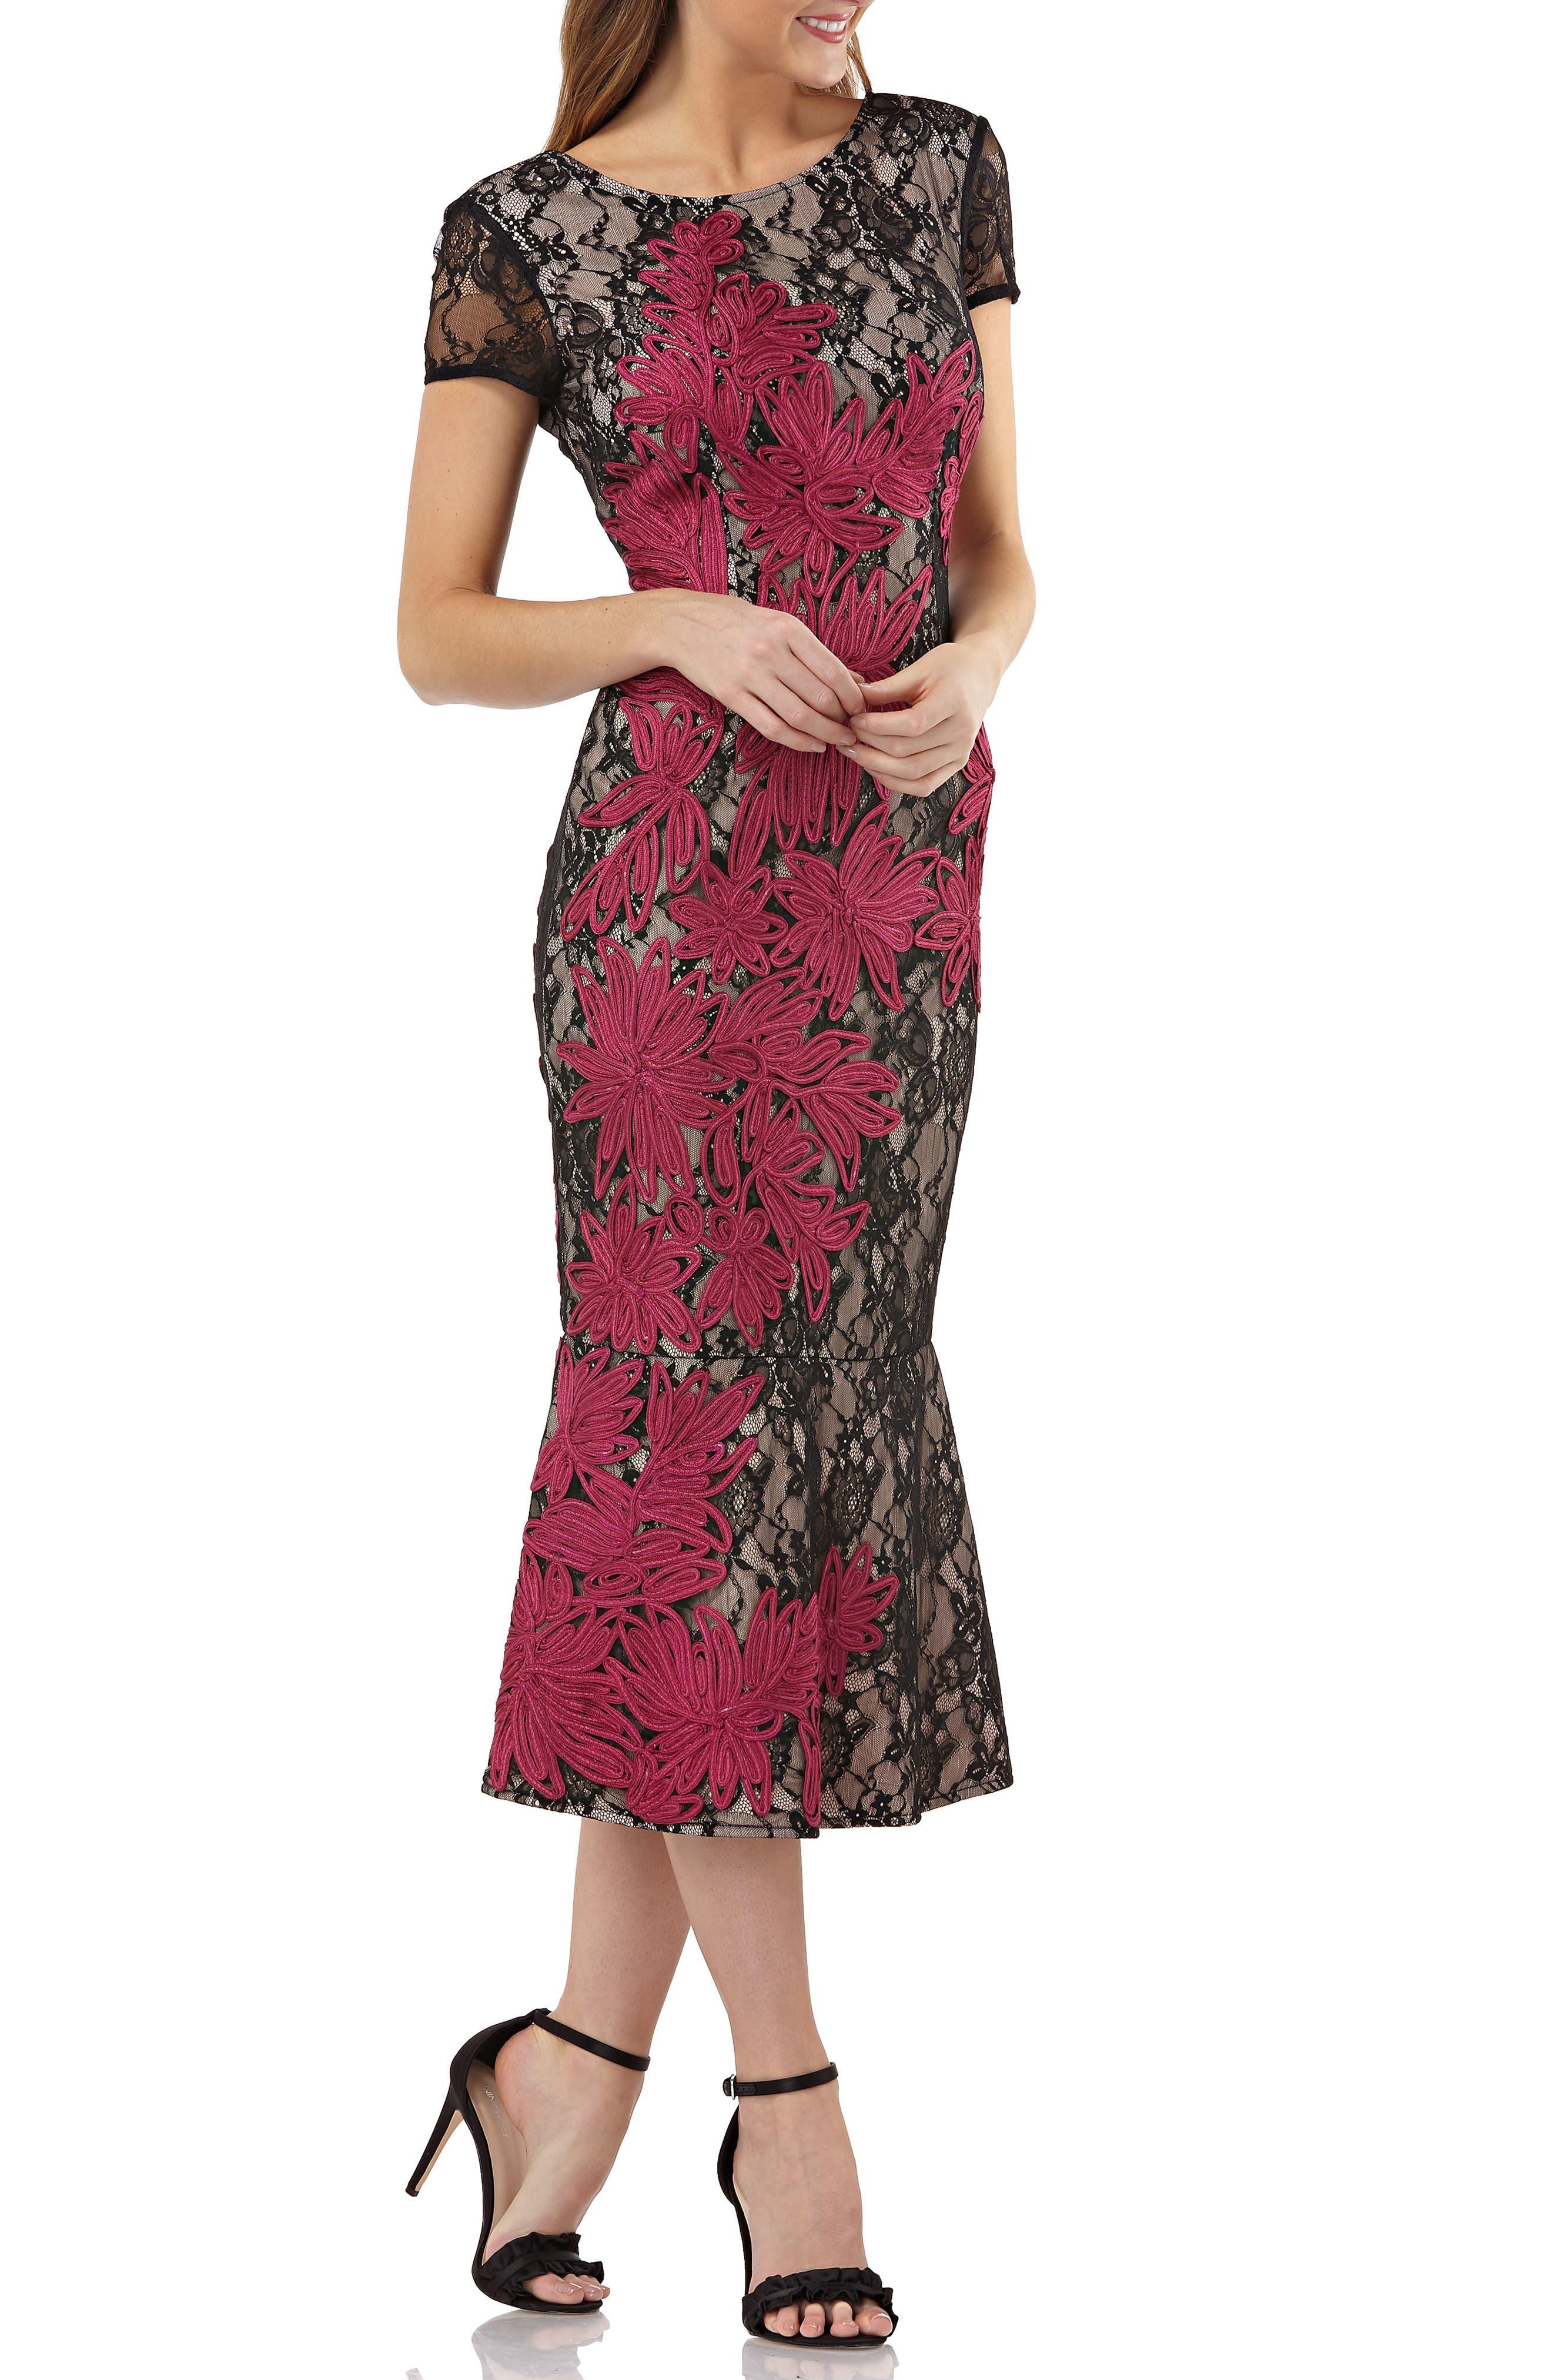 Js Collections Soutache Embroidered Lace Dress, Black